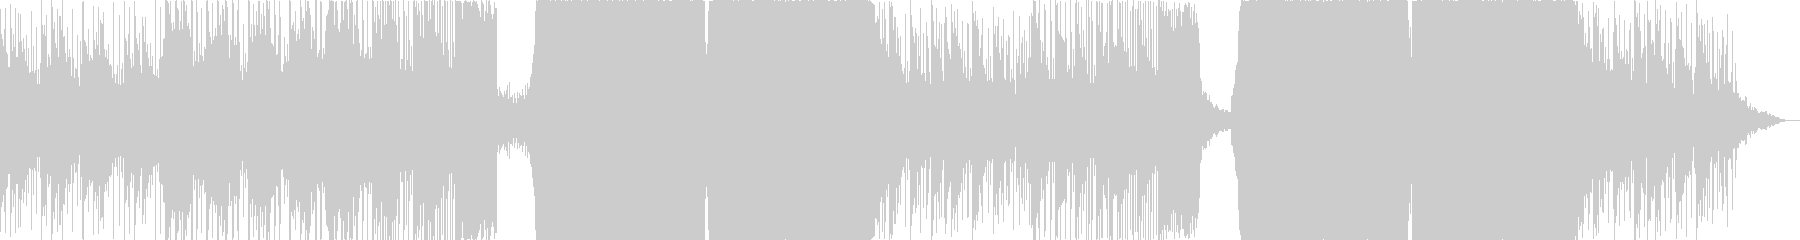 Liquid Dubstep新FULLの未再生の波形